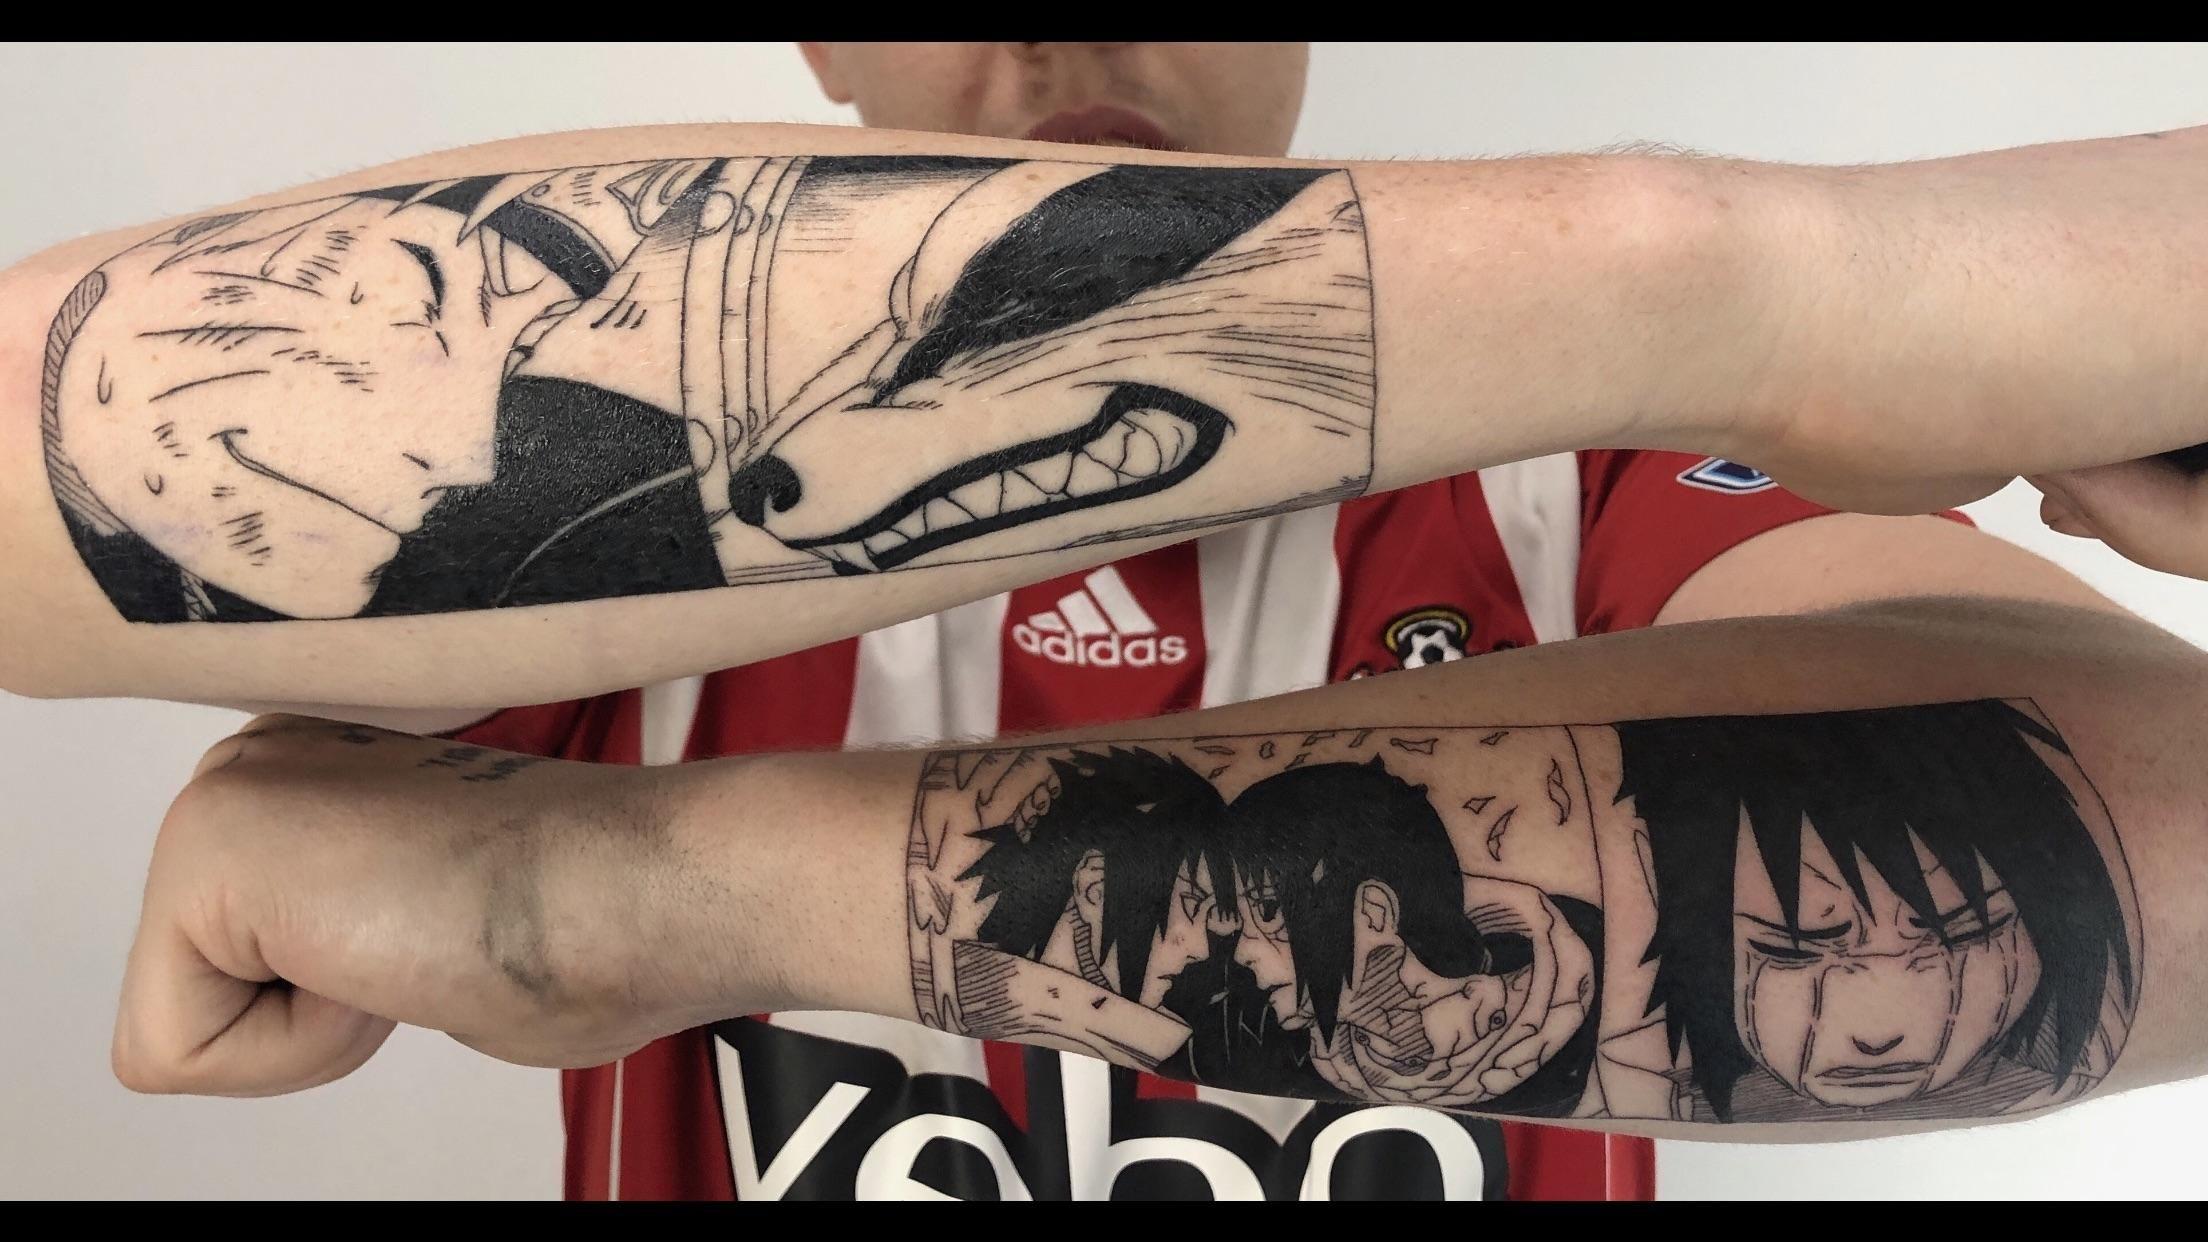 My Naruto And Kurama And Sasuke And Itachi Pieces By Justin Tolentino At Skin Design Tattoo In Las Vegas Sasuke And Itachi Naruto Tattoo Tattoos